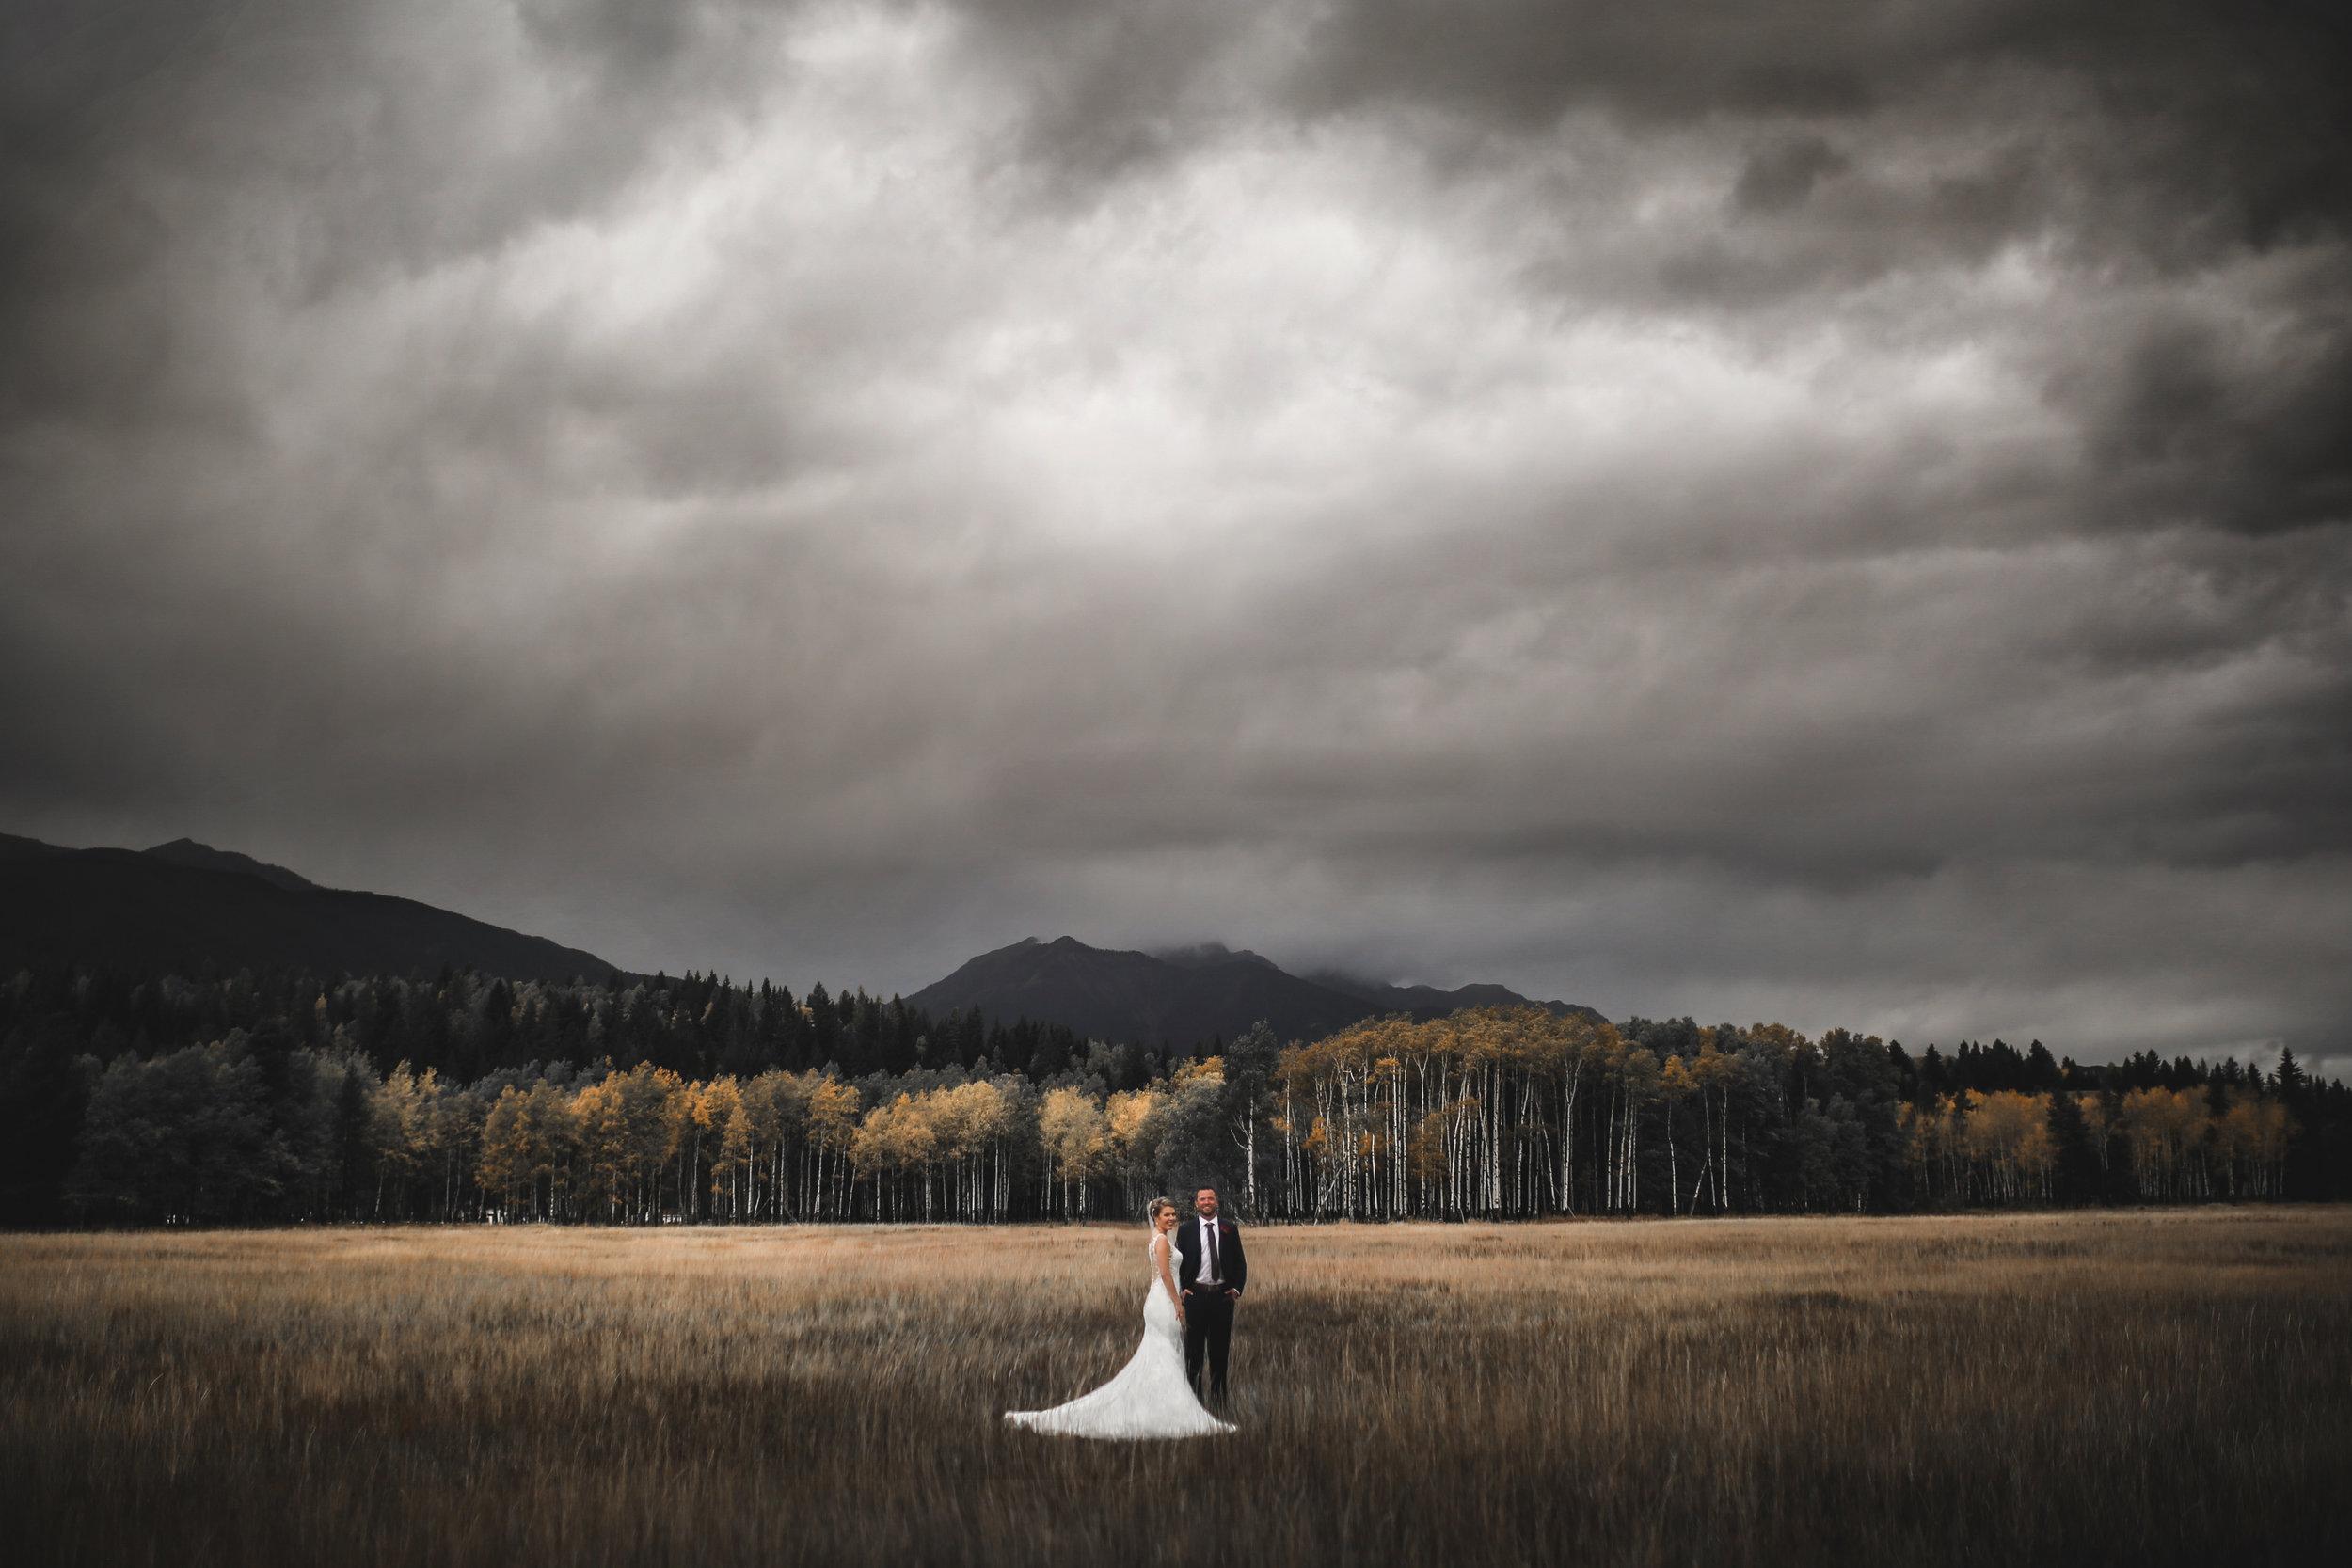 155 Adam Ziorio Photography - Vitoria wedding photographer Nick&Bree Fernie Wedding.jpg